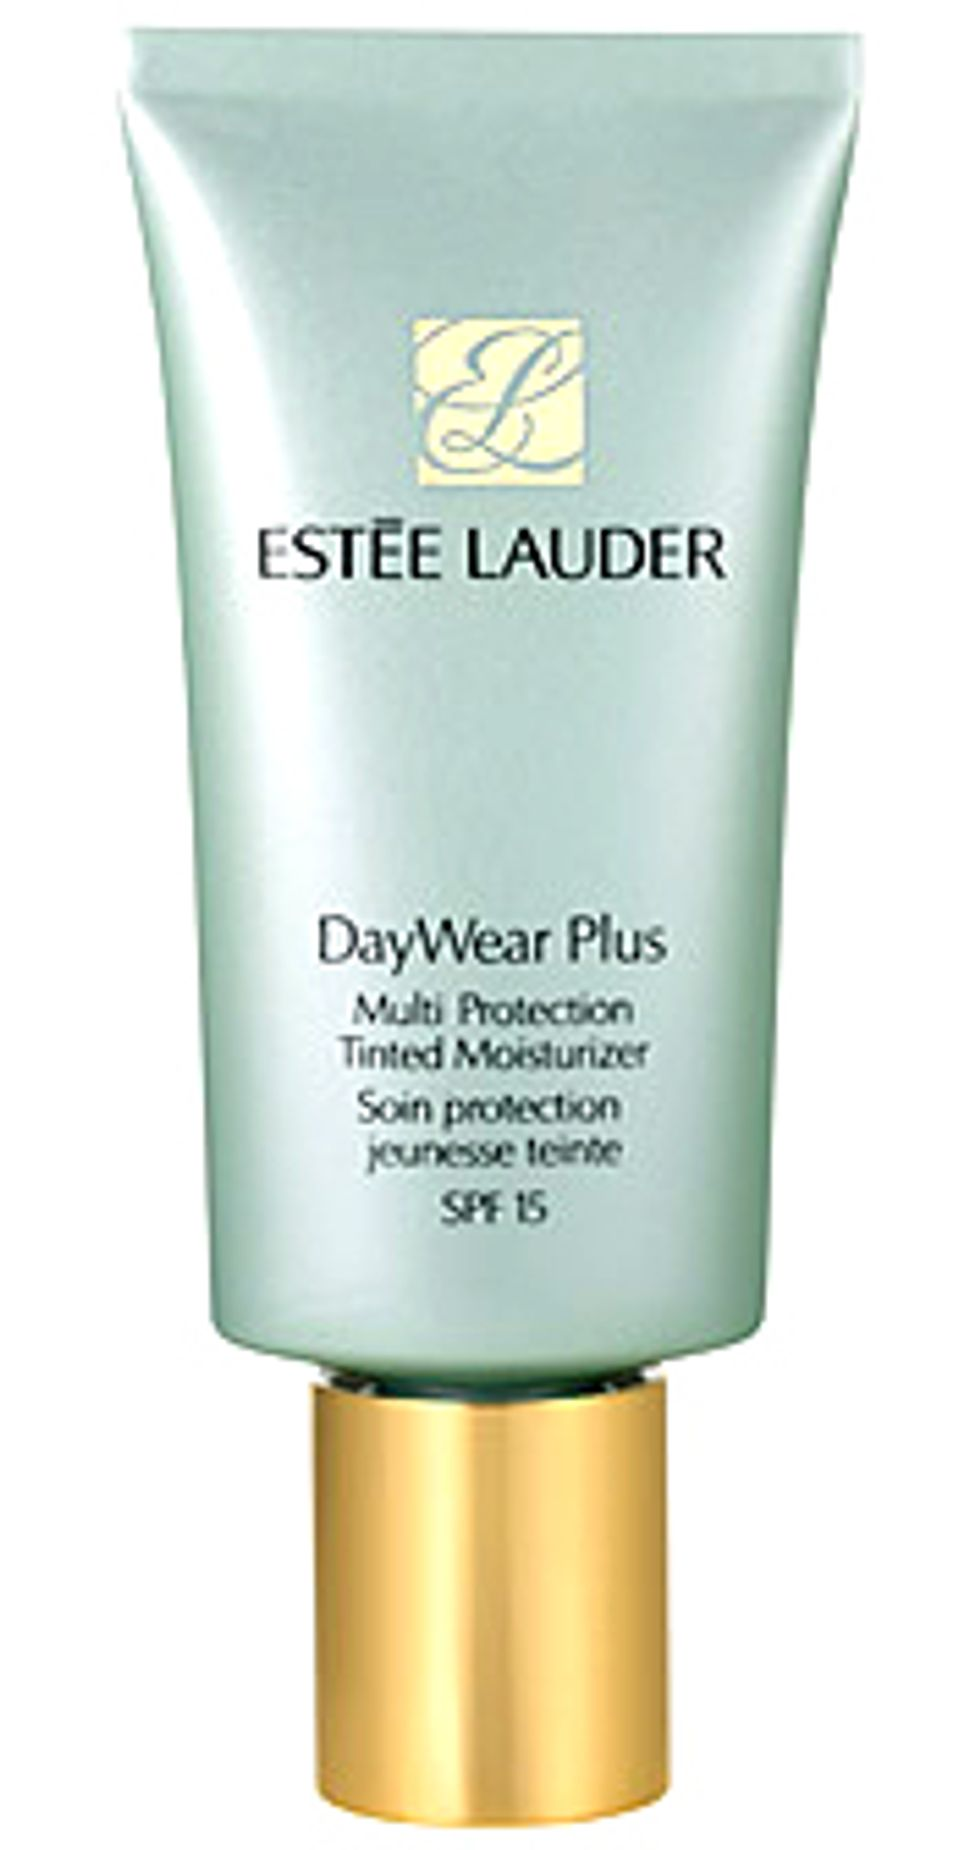 Crème de la Crème: Get Your Summer Skin in Order with Estee Lauder Tinted Moisturizer